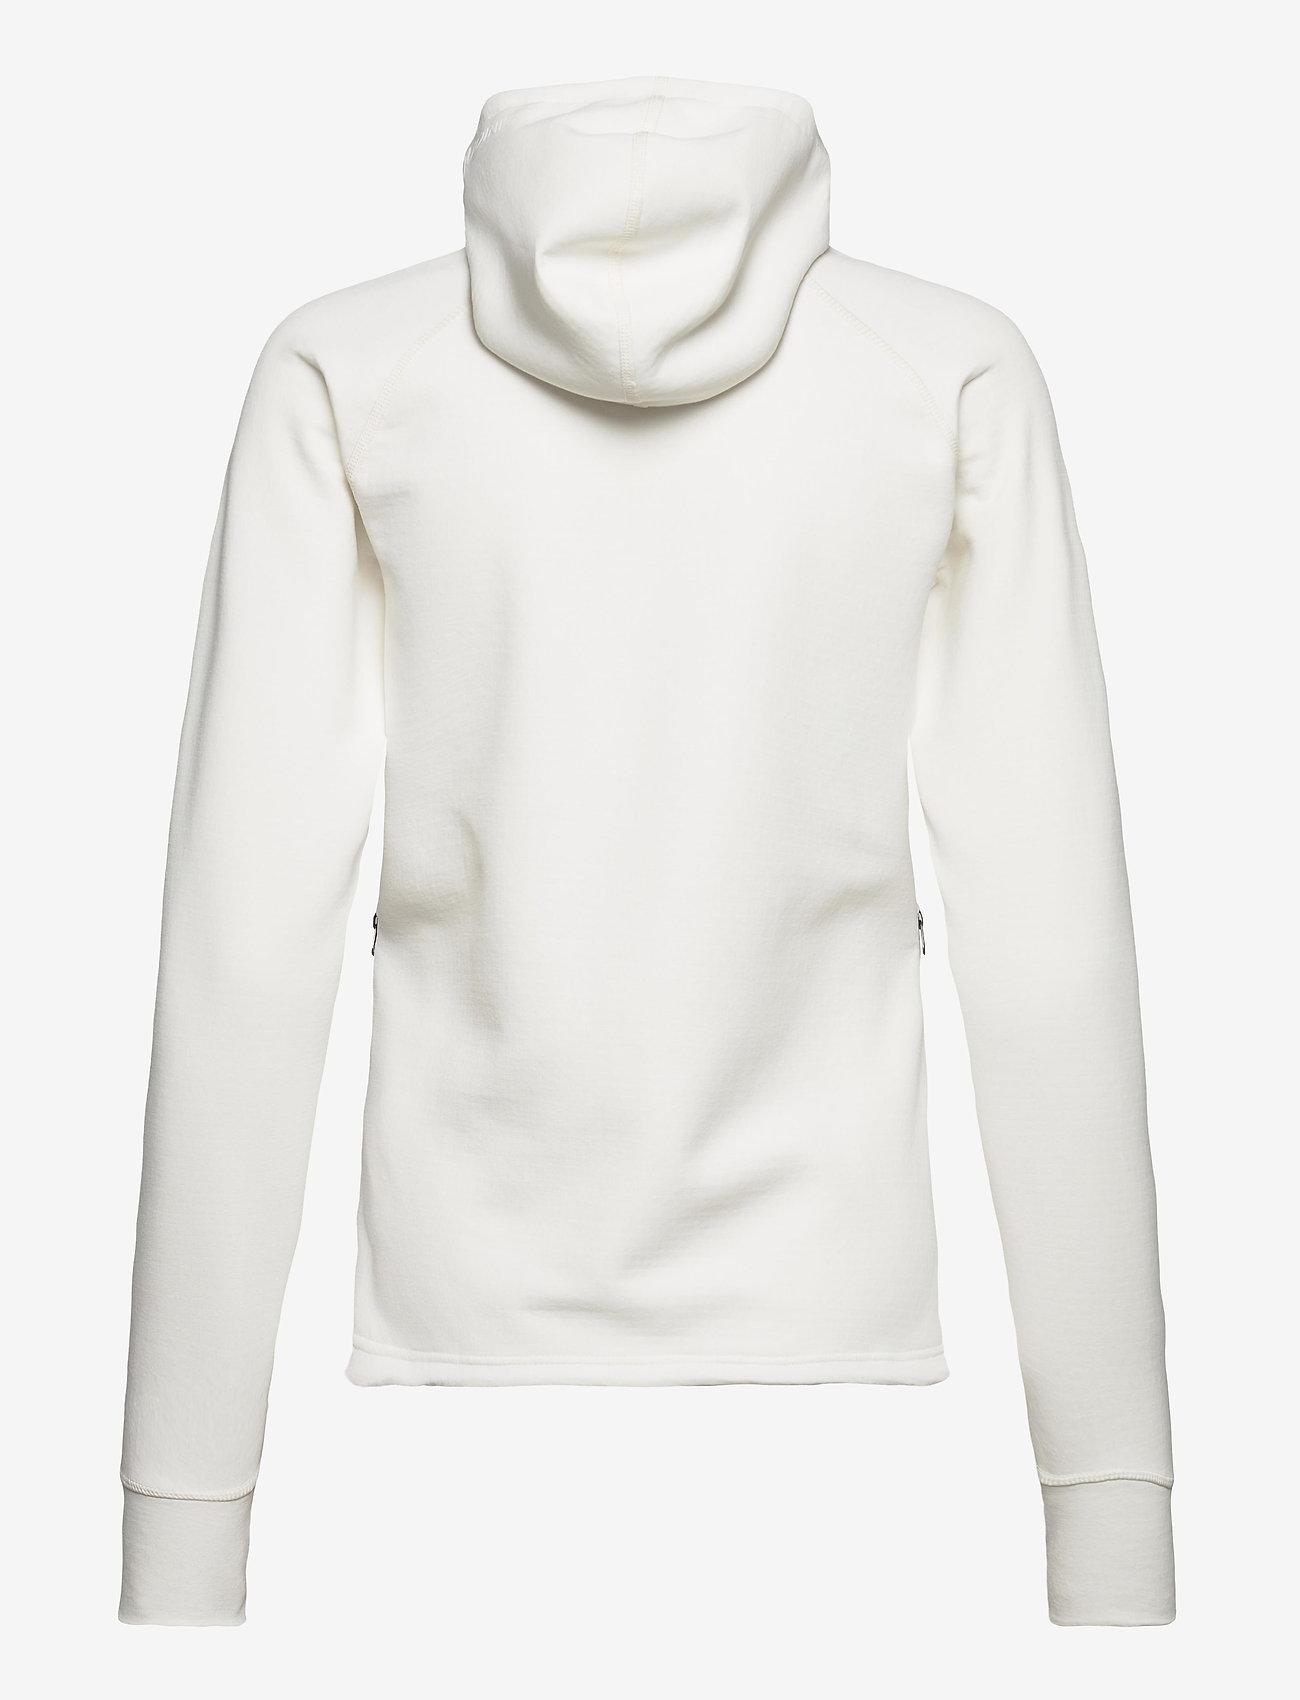 Houdini - W's Mono Air Houdi dulcet Pink XS - hoodies - powderday white - 1